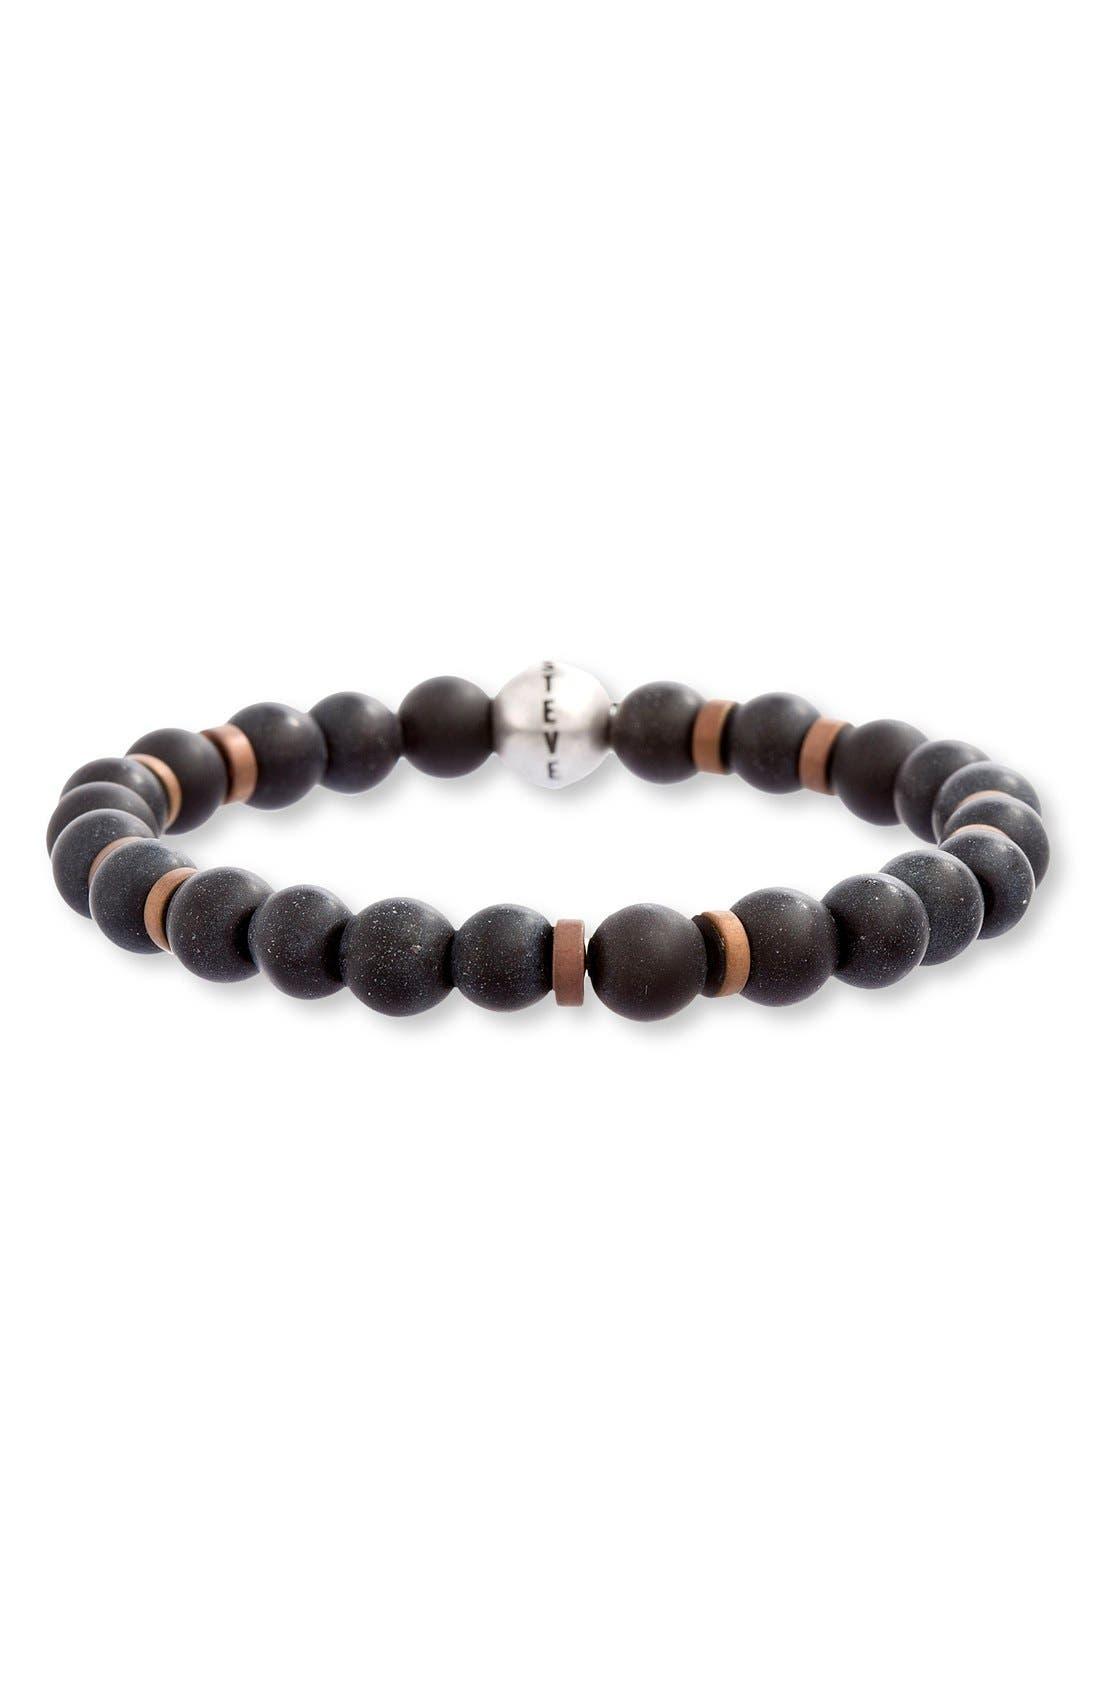 Wood Bead Bracelet,                             Main thumbnail 1, color,                             001